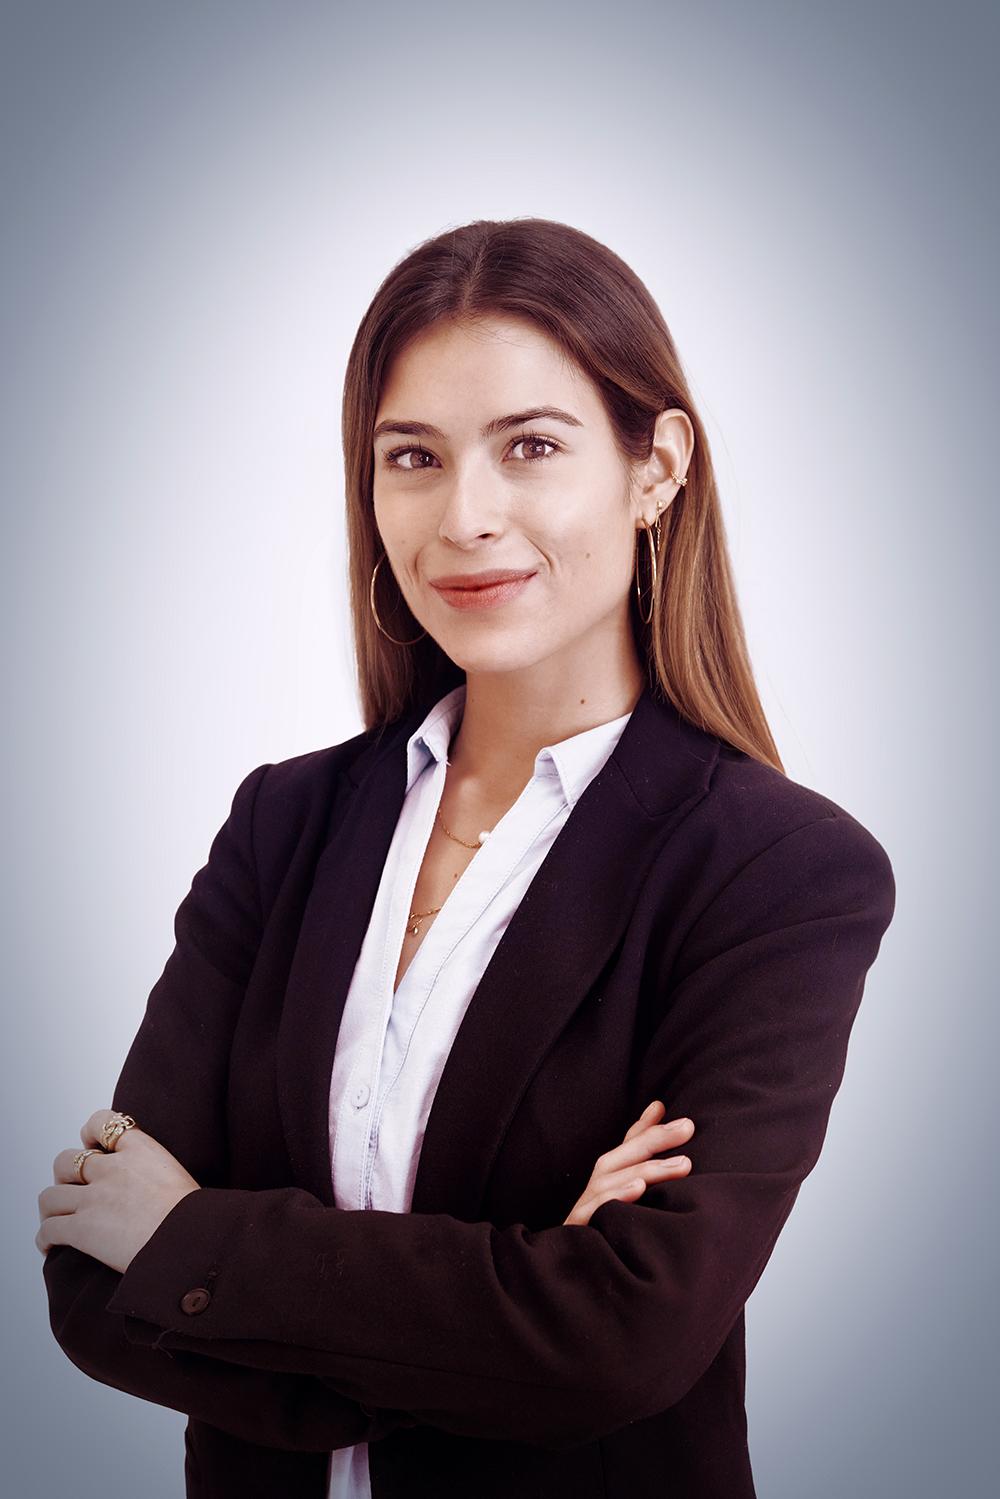 Marta Alonso Campos